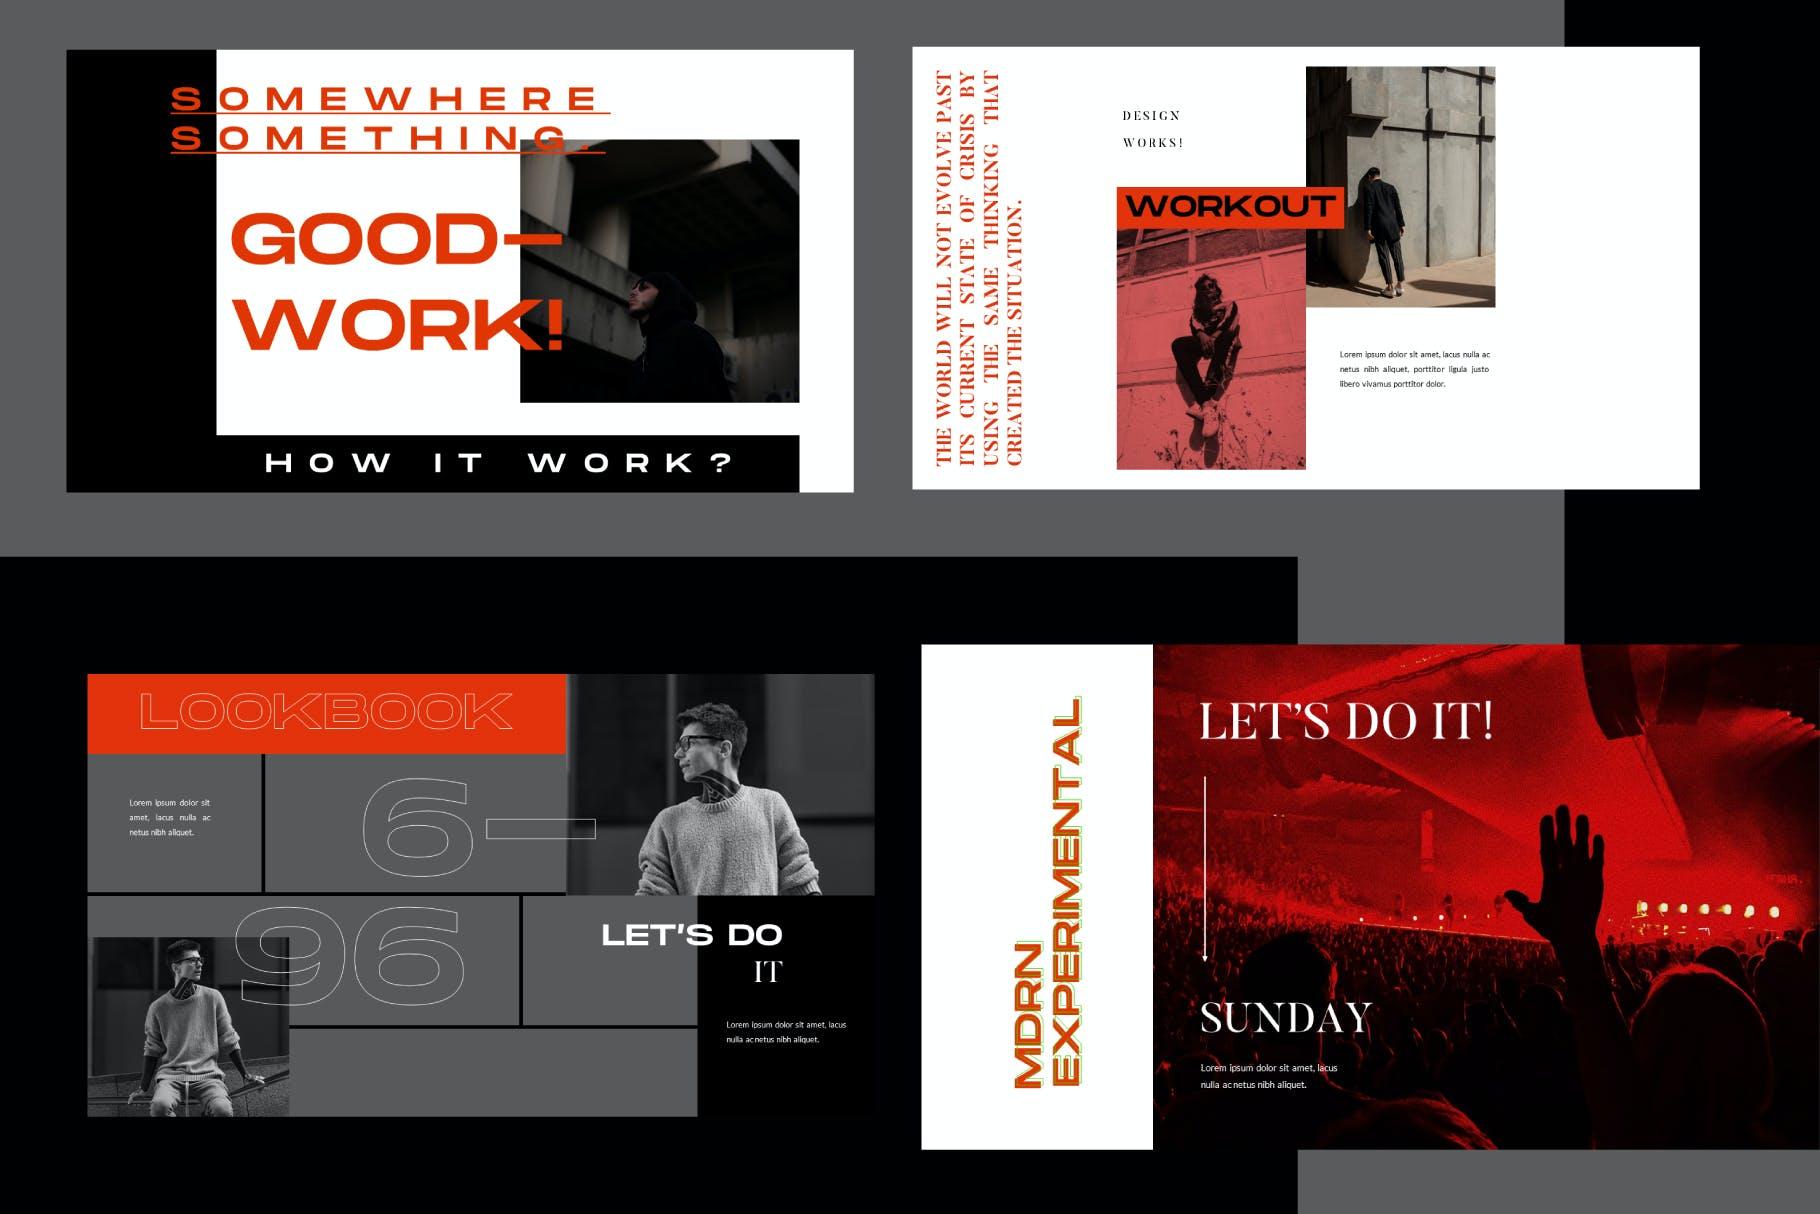 PowerPoint演示模板时尚促销活动 WORKOUT – Powerpoint Template设计素材模板